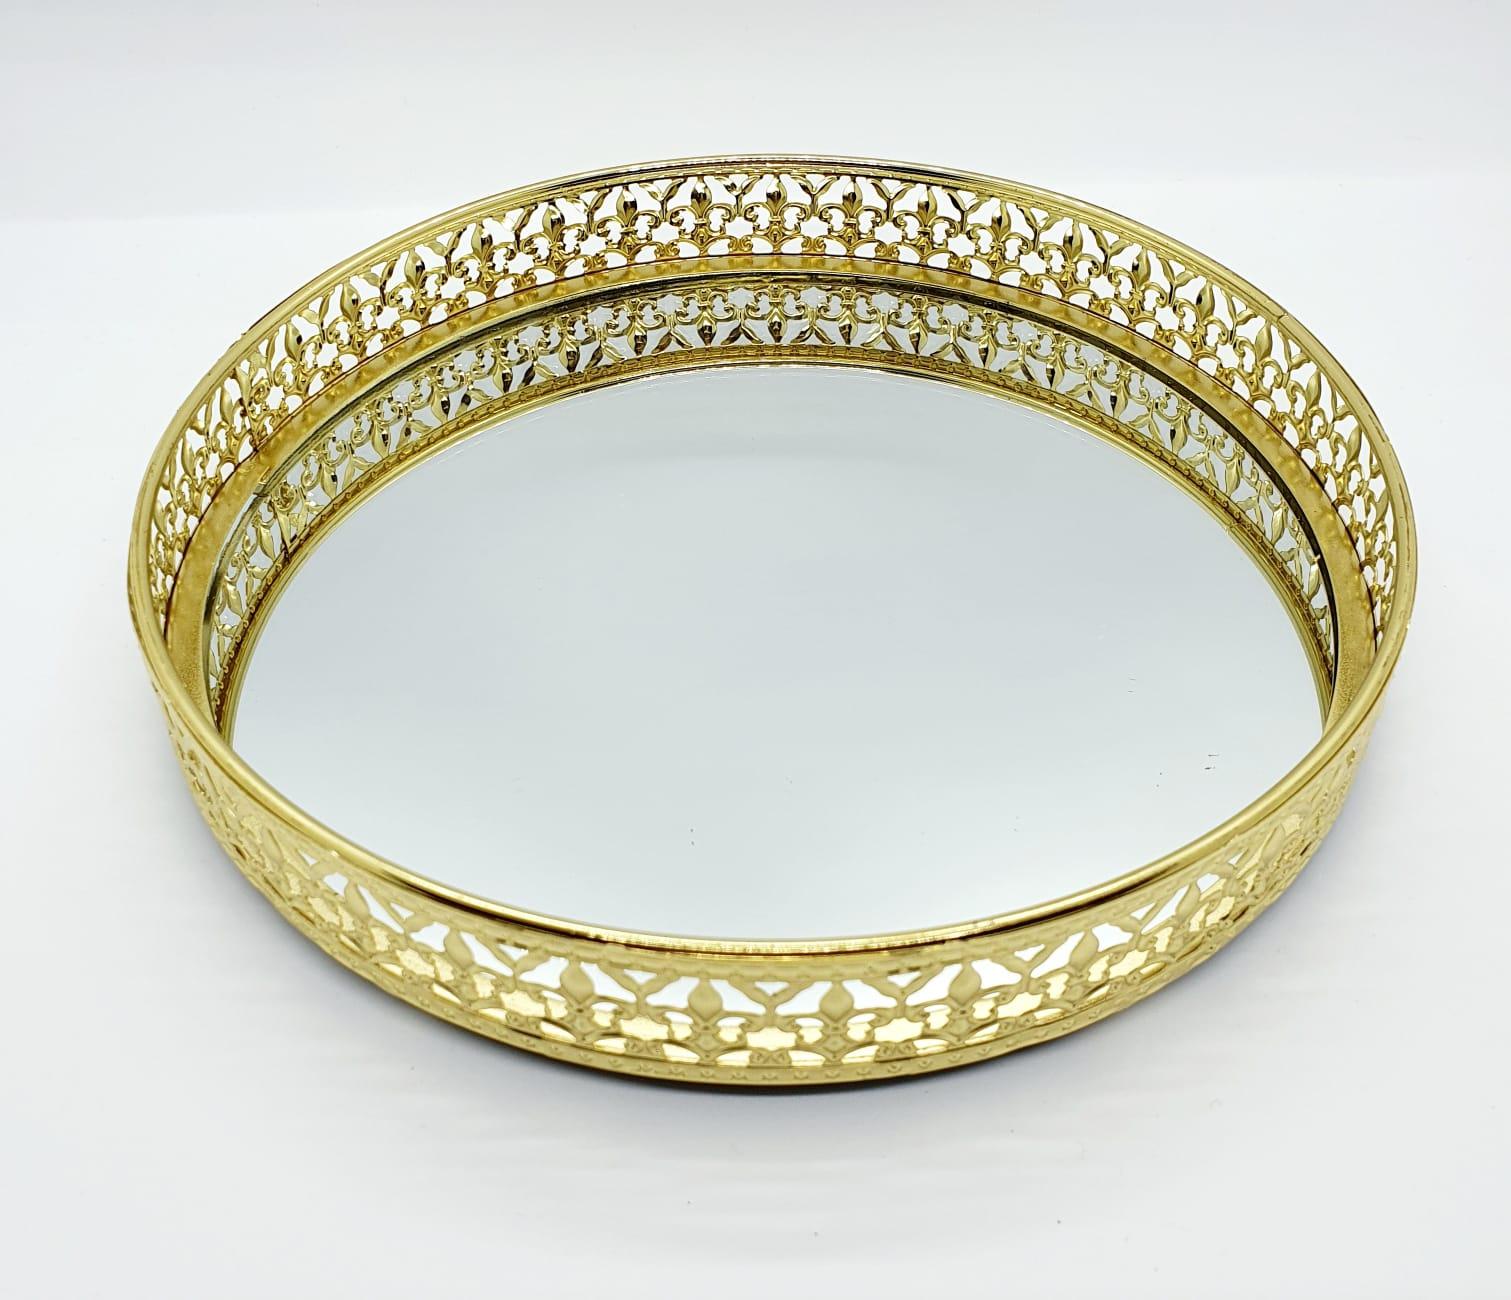 Bandeja decorativa de metal espelhada